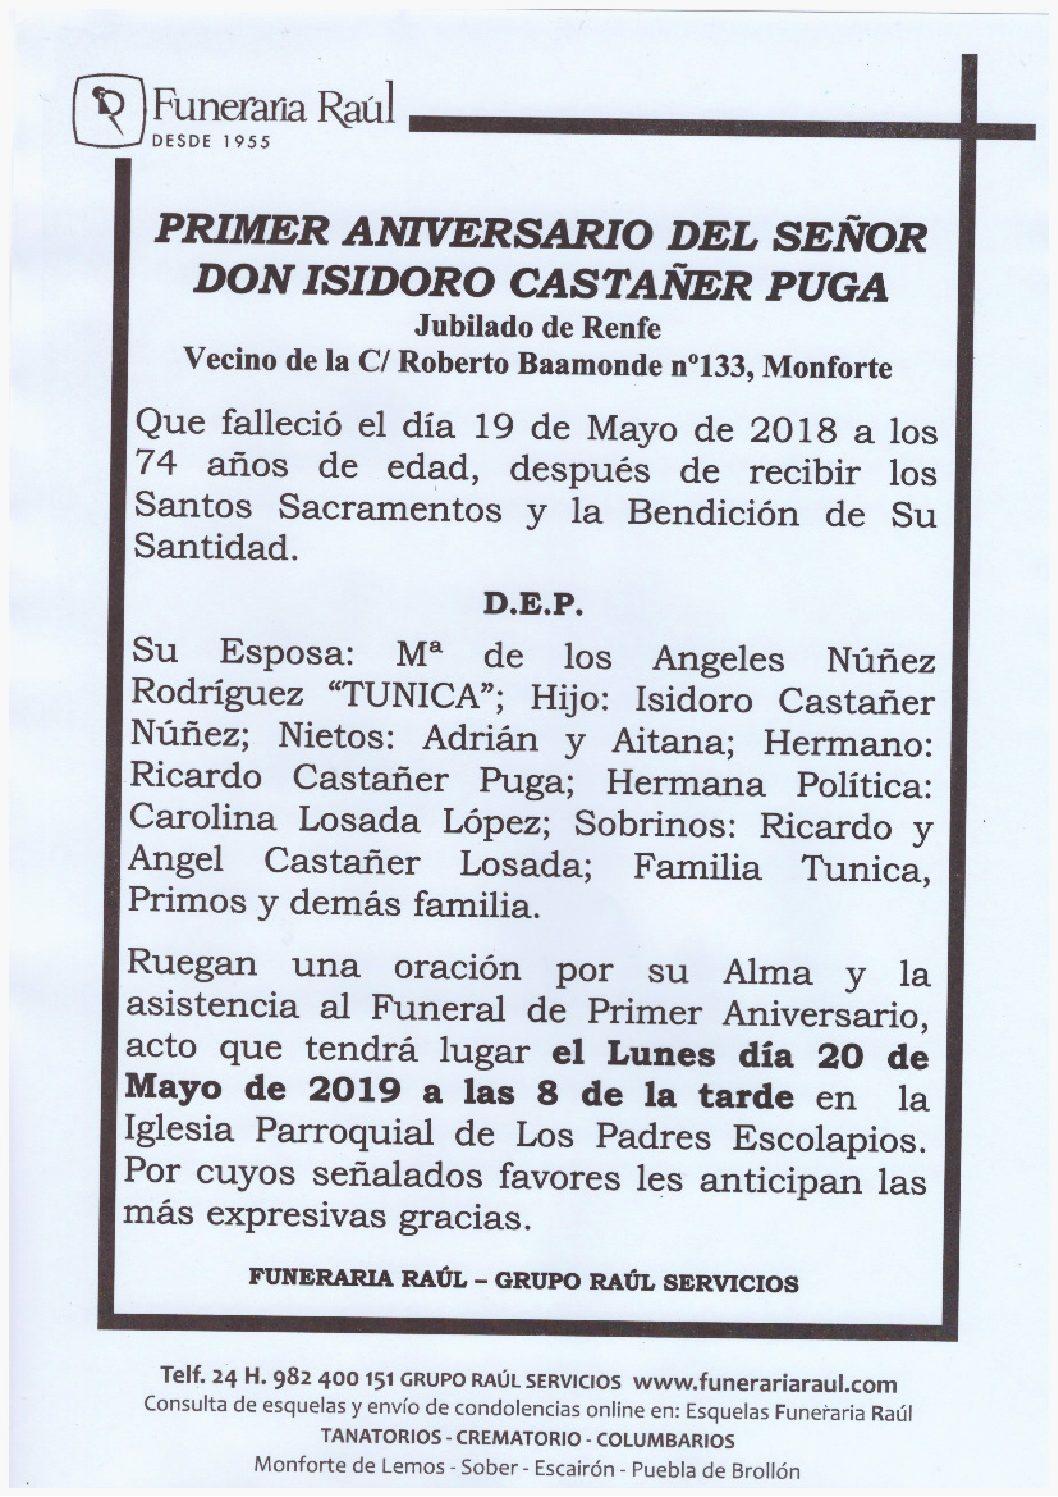 PRIMER ANIVERSARIO DE DON ISIDORO CASTAÑER PUGA